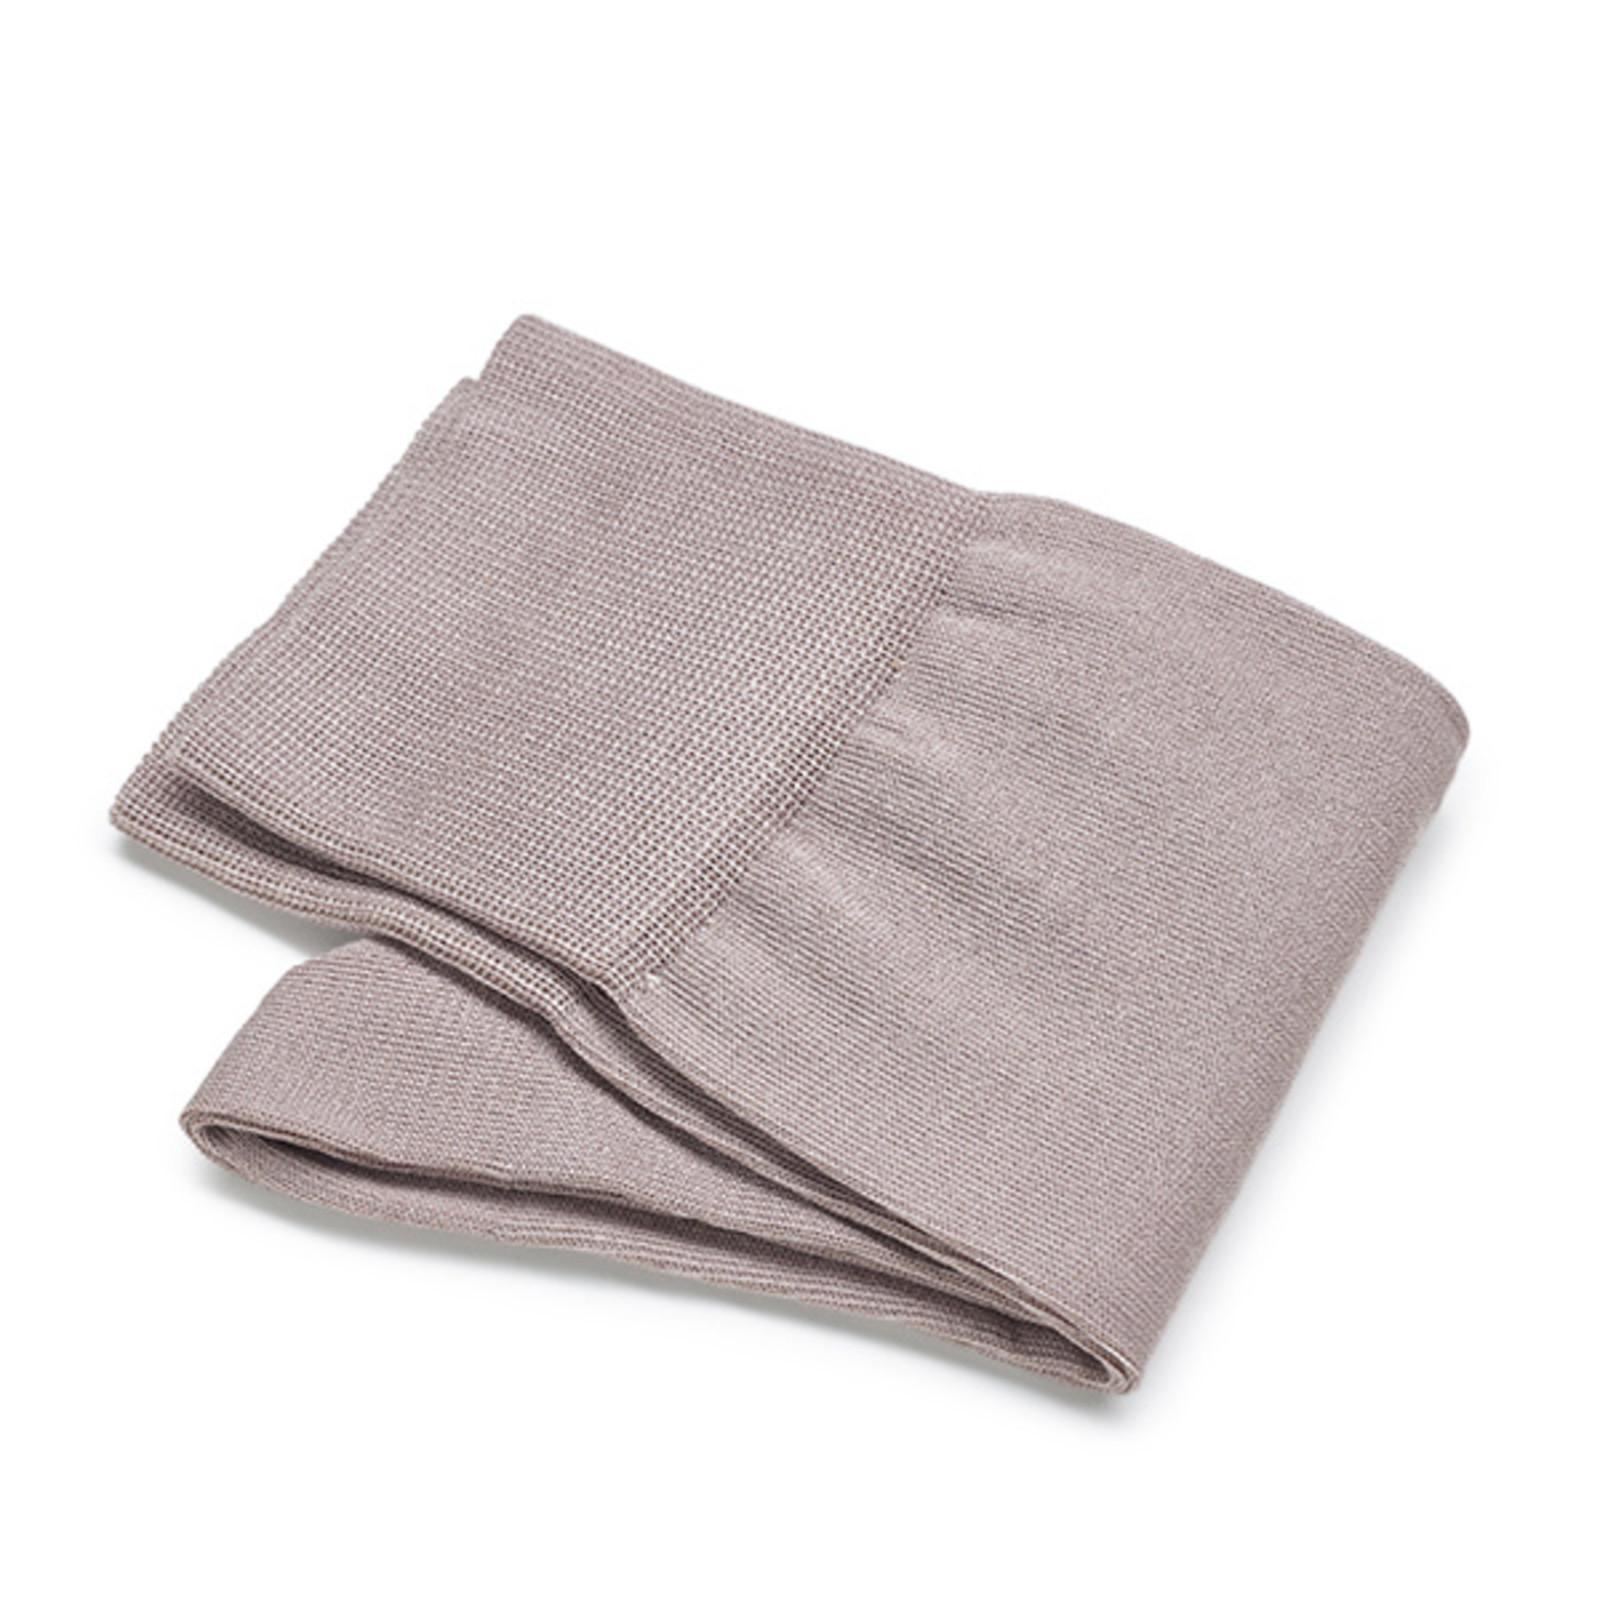 Carlo Lanza Champagne cotton socks